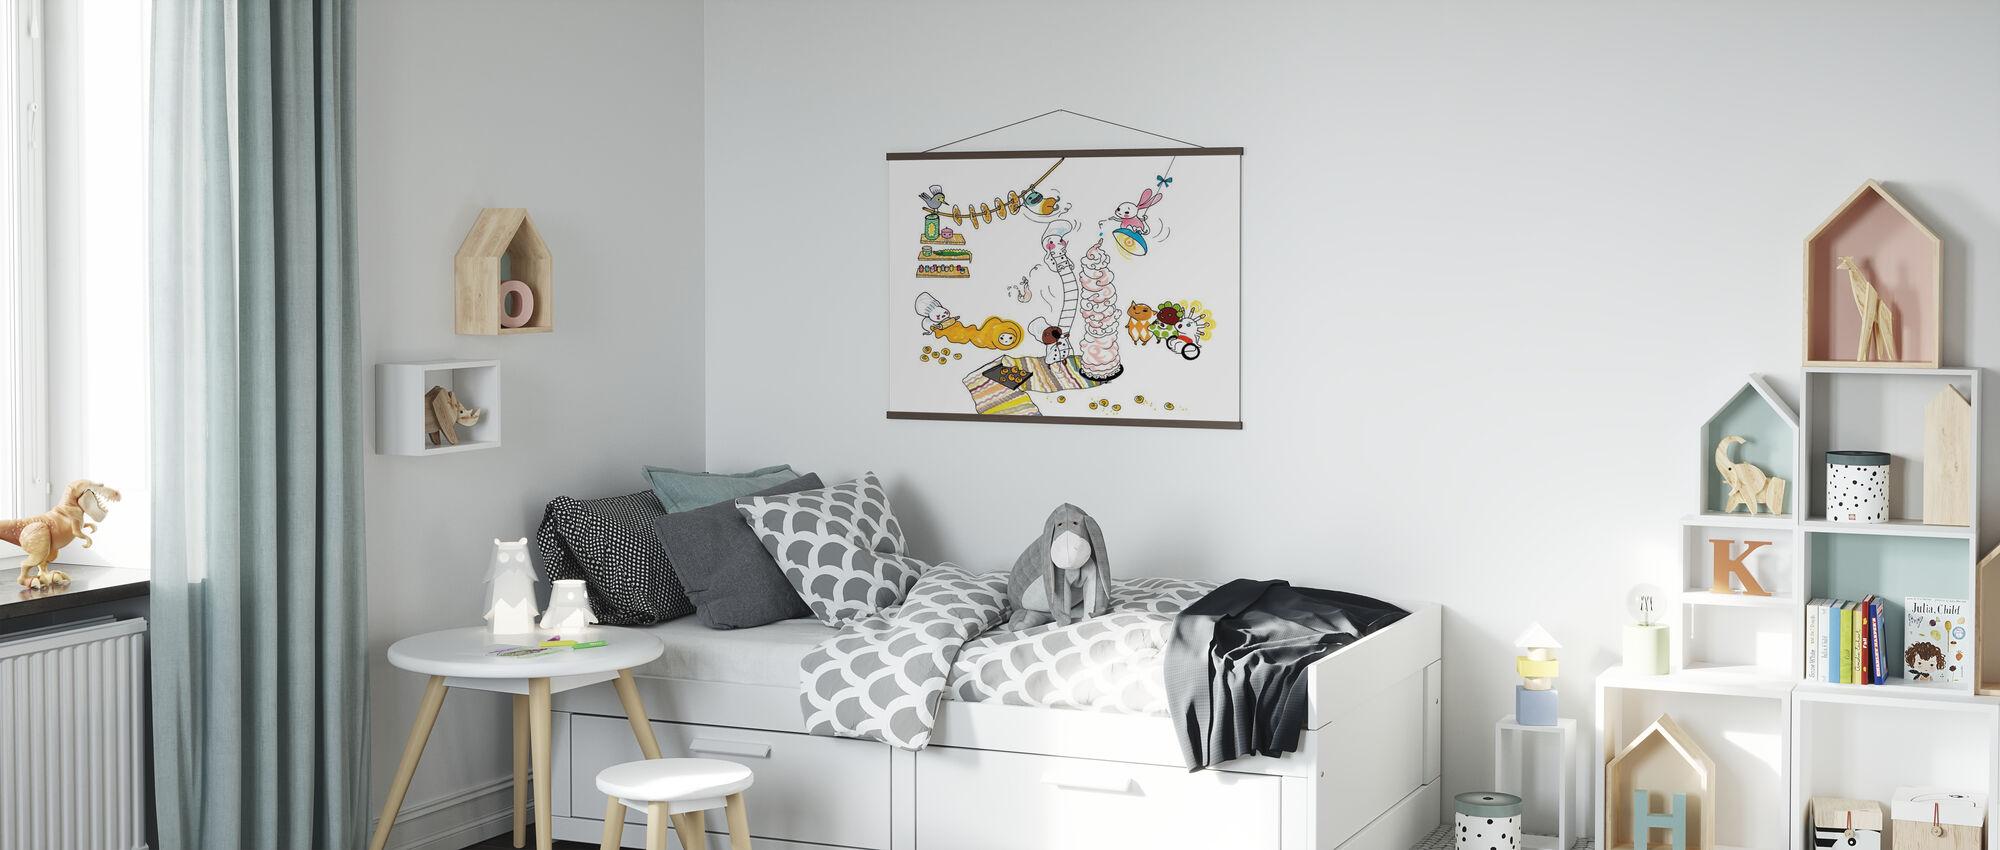 hiernamaals - Poster - Kinderkamer